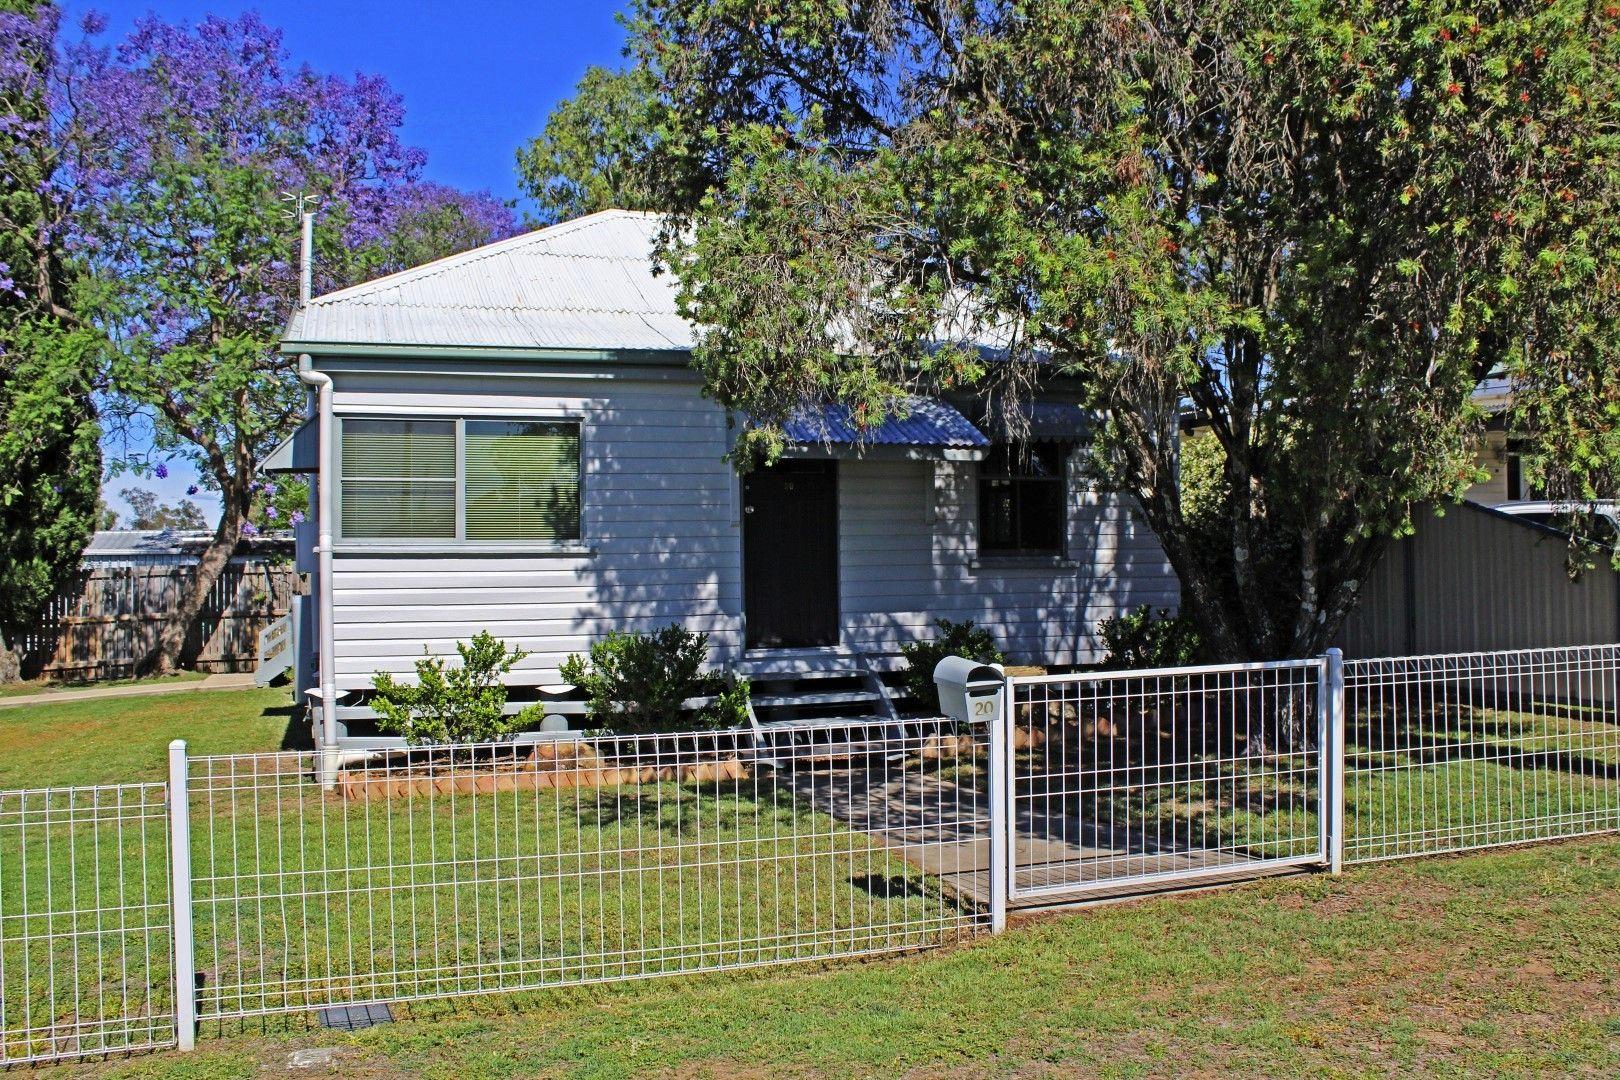 20 George St, Warwick QLD 4370, Image 0